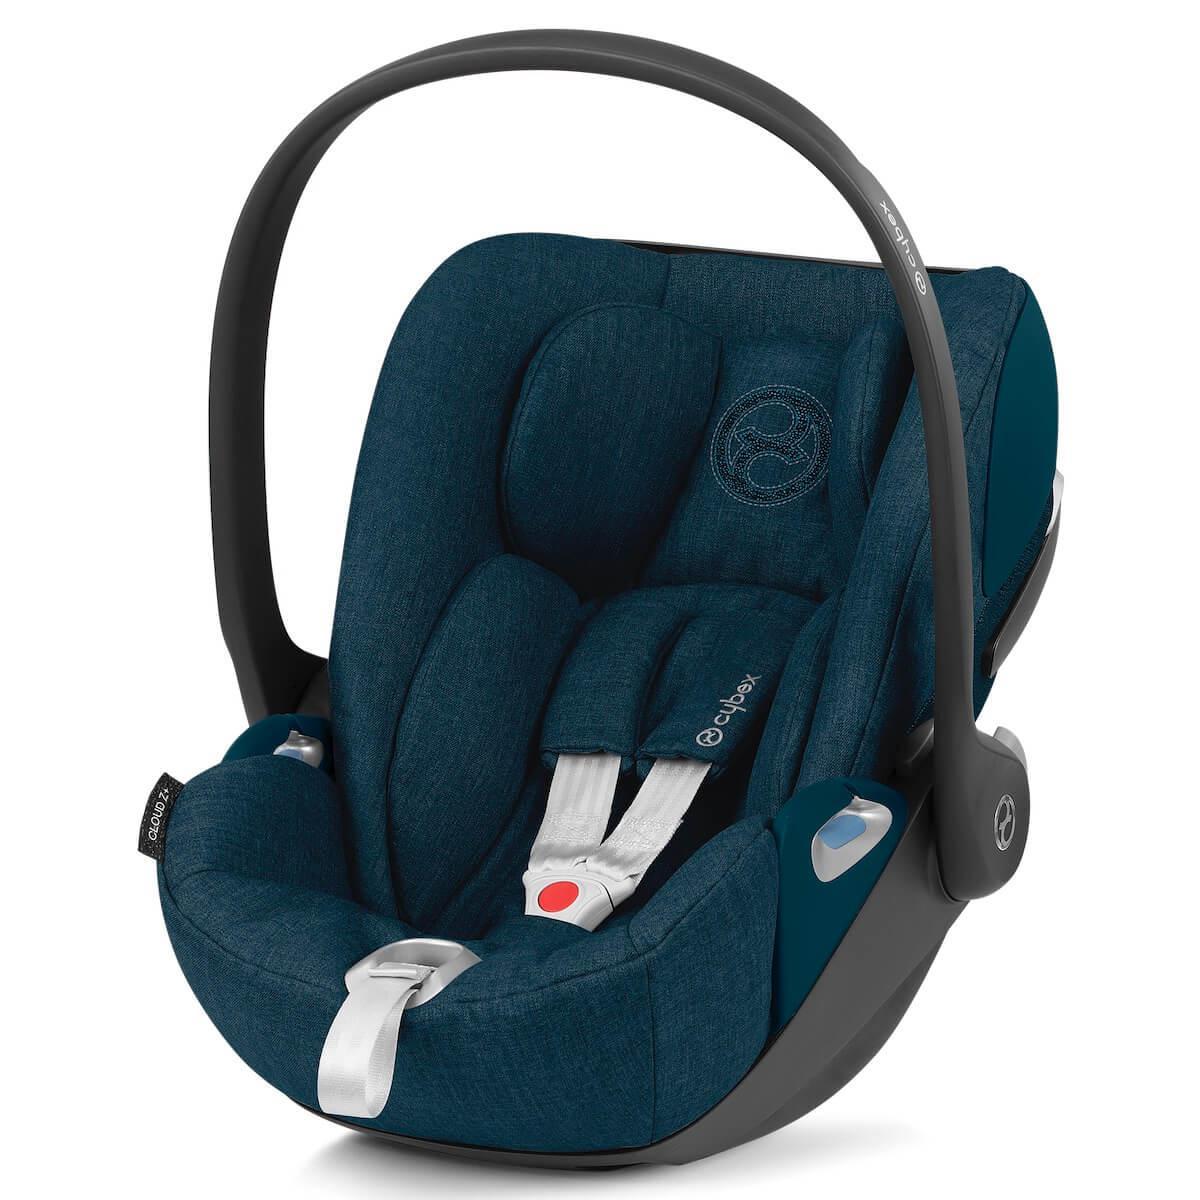 Silla auto 0+ CLOUD Z I-SIZE PLUS Cybex Mountain blue-turquoise